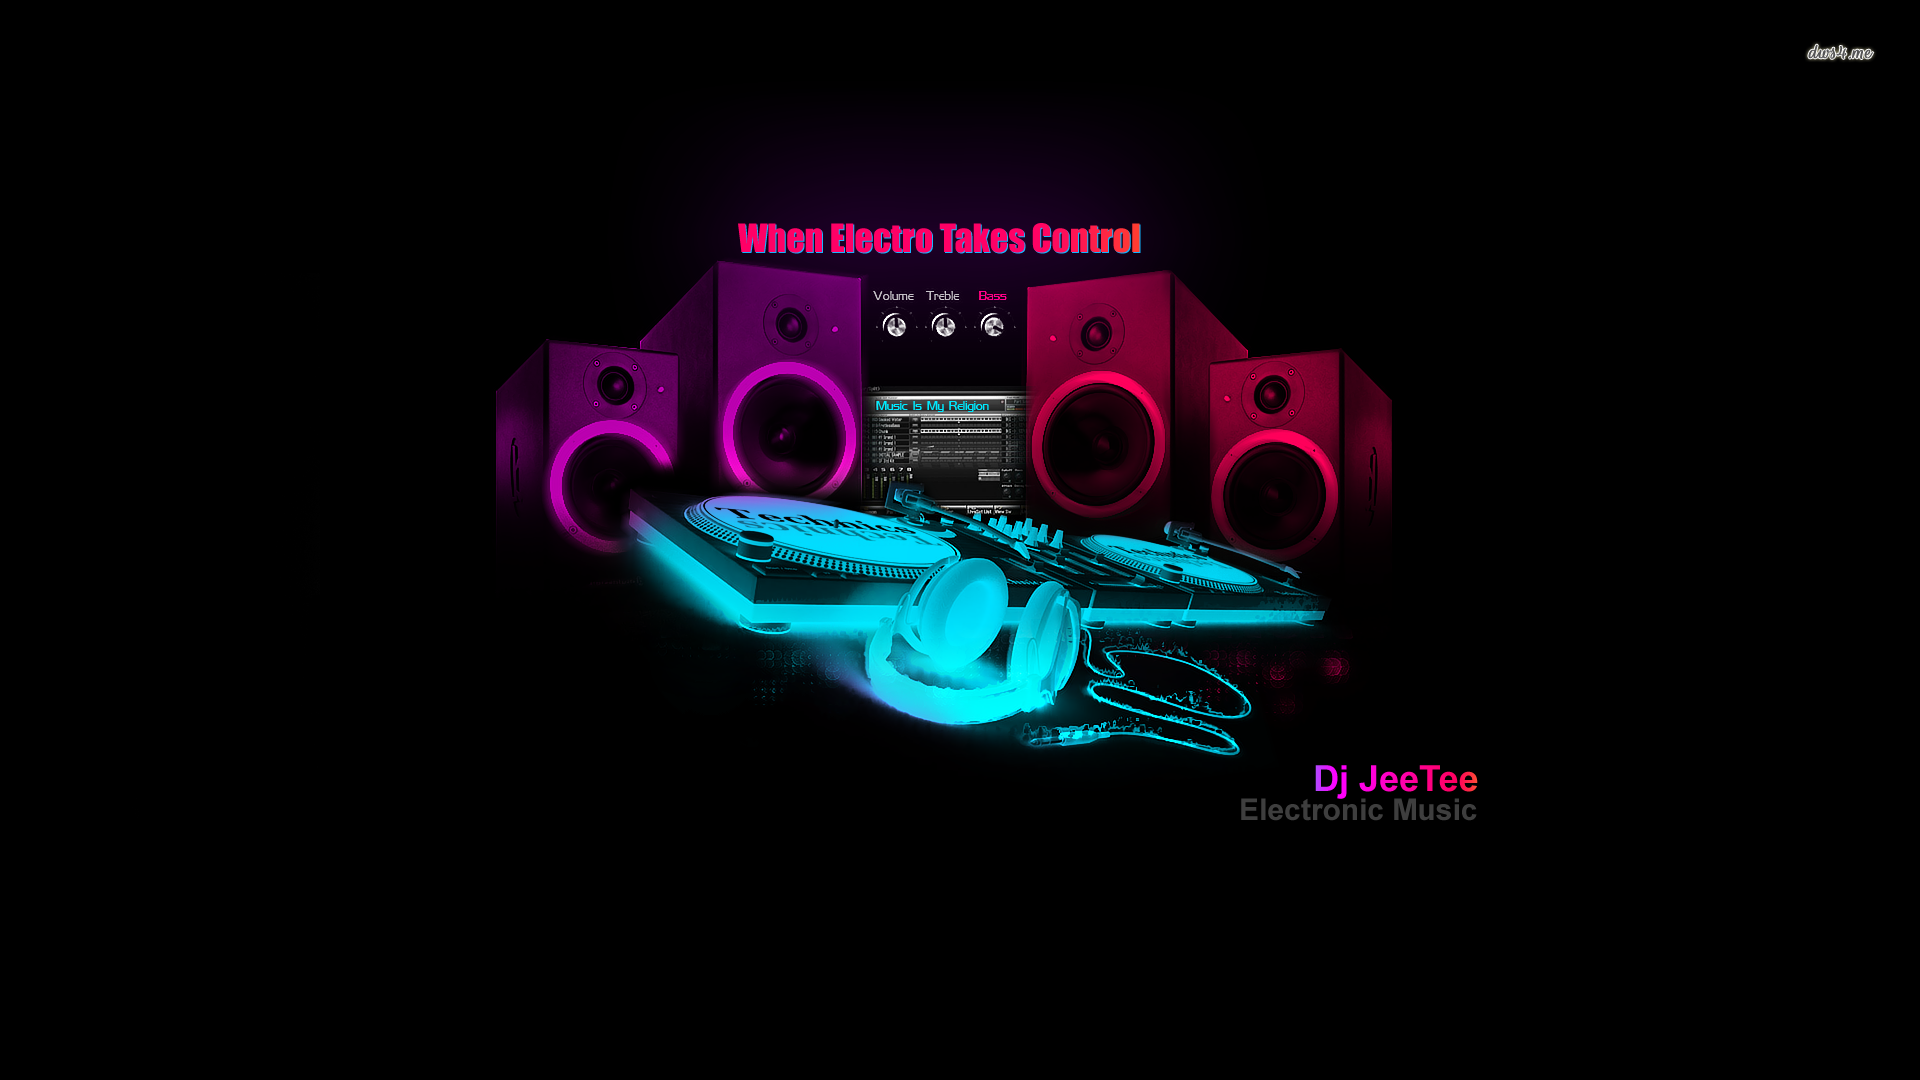 Dj Speakers Wallpaper Music Wallpaper House Music Dj Music Notes Background